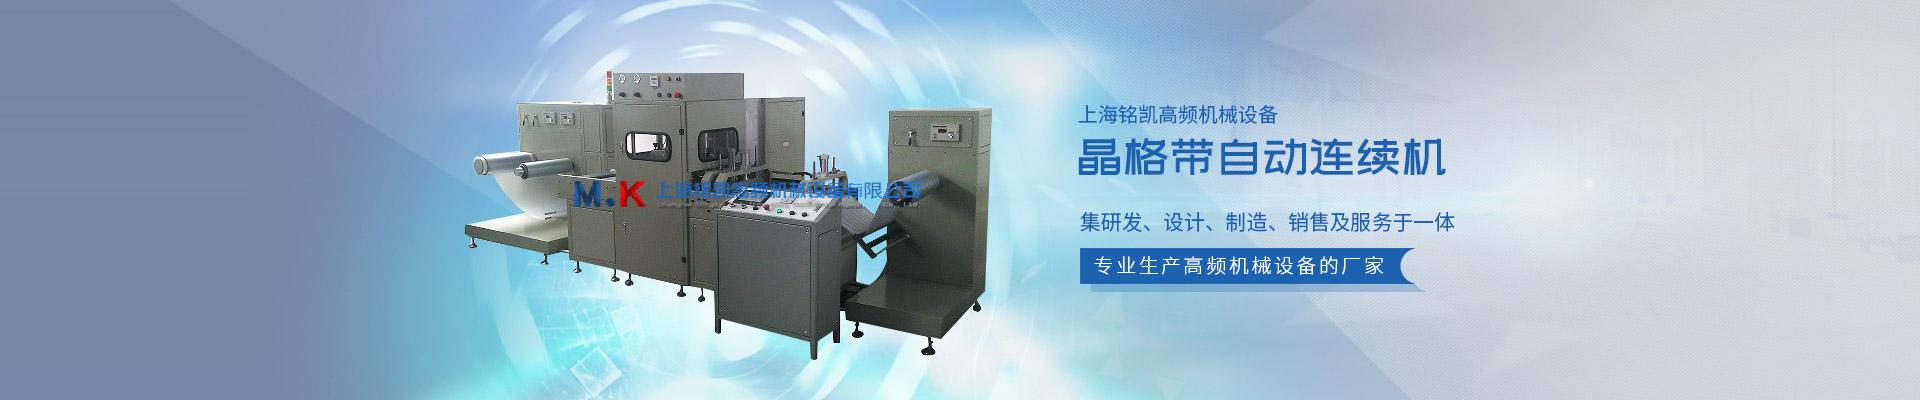 上海铭凯高频机械设备有限公司